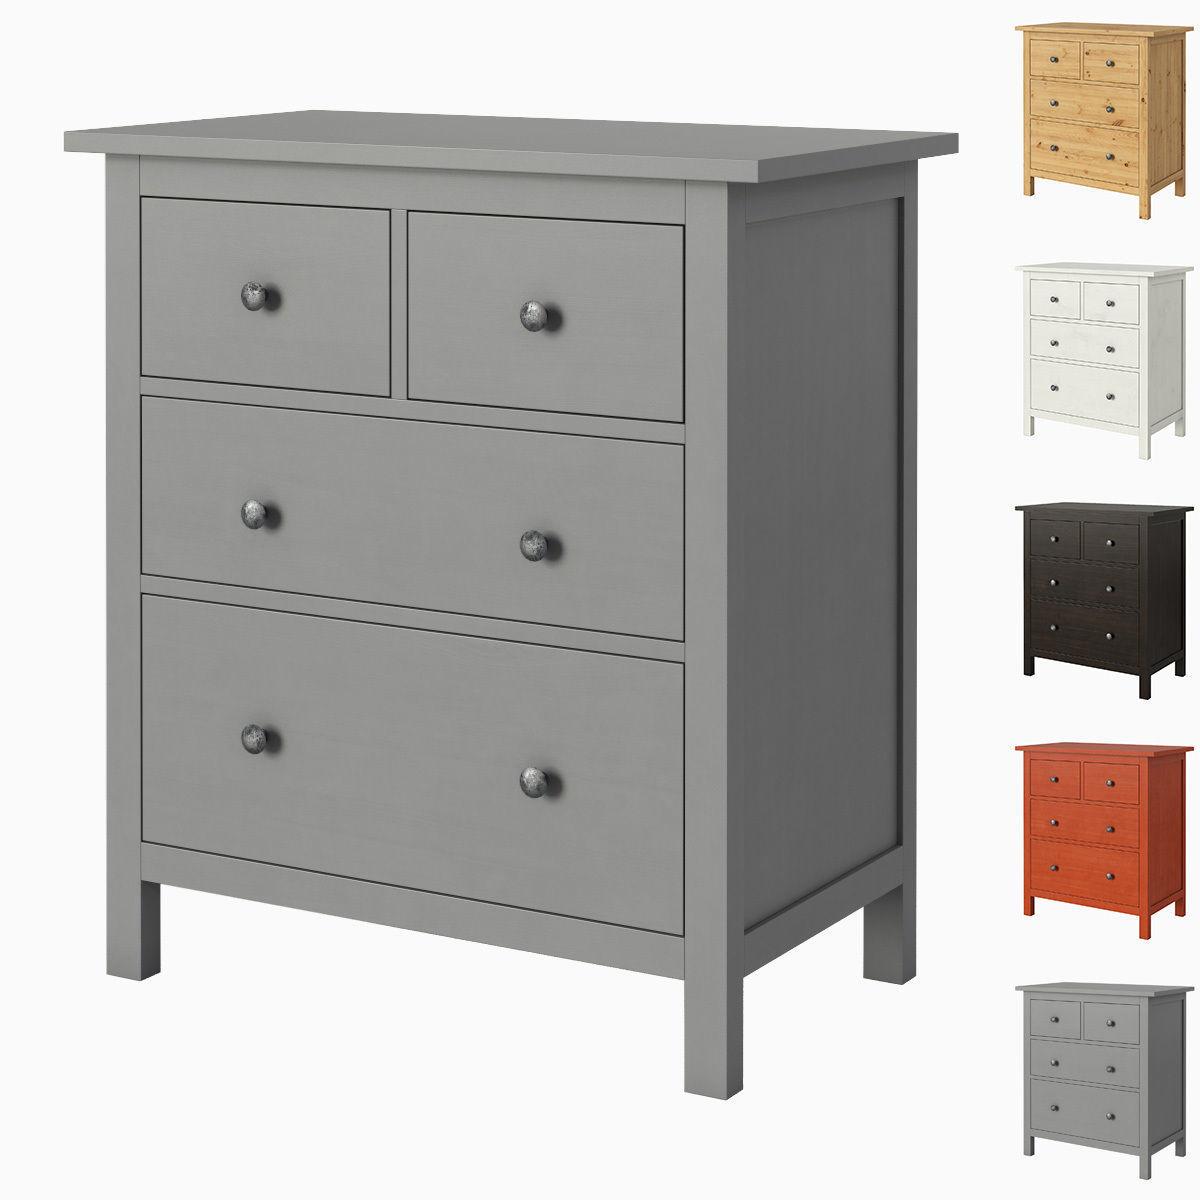 HEMNES 4-drawer chest